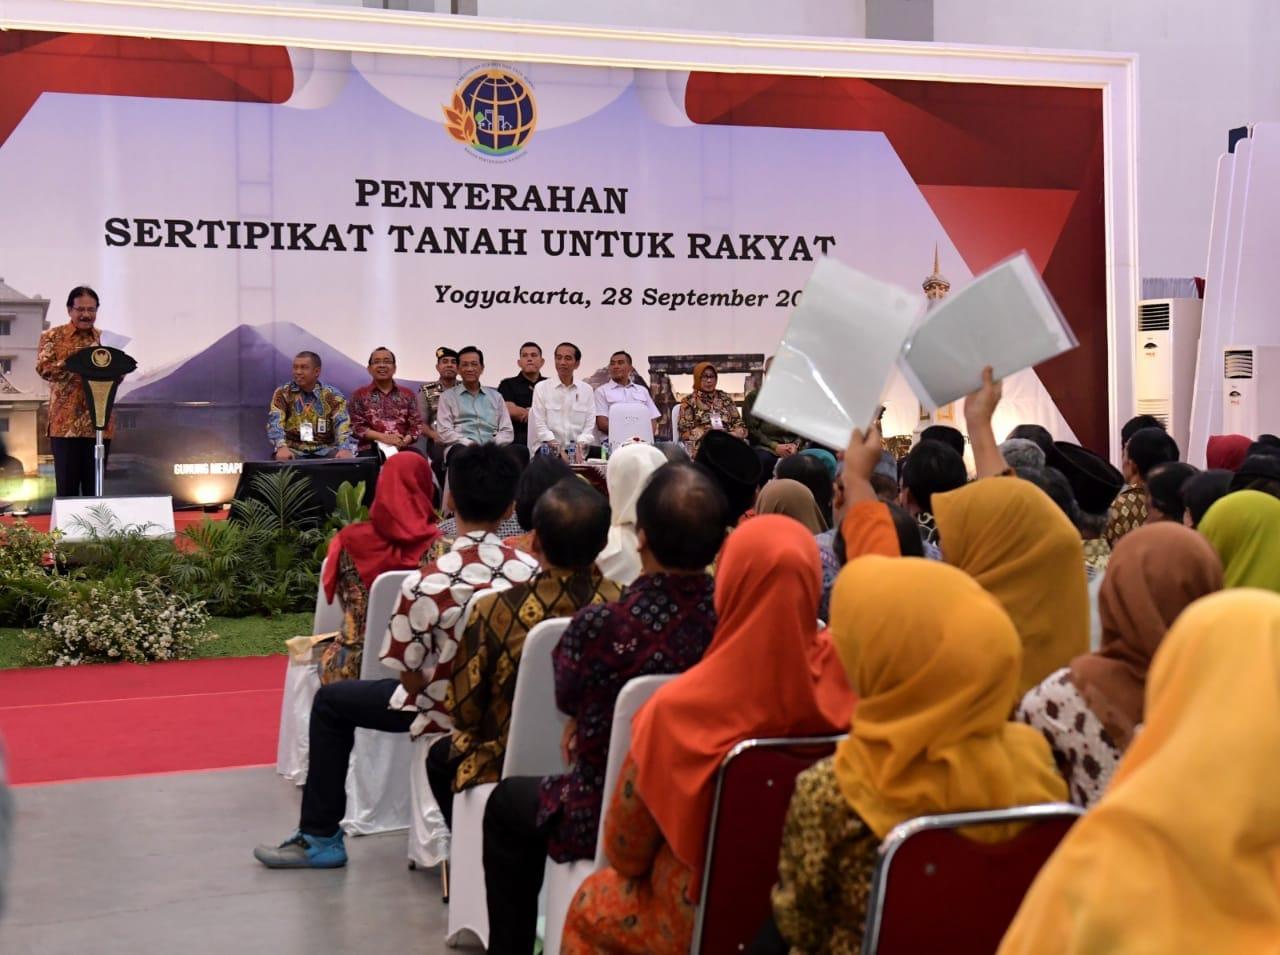 serahkan-sertifikat-di-yogyakarta-presiden-jokowi-tugas-bpn-itu-cepat-melayani-rakyat-10